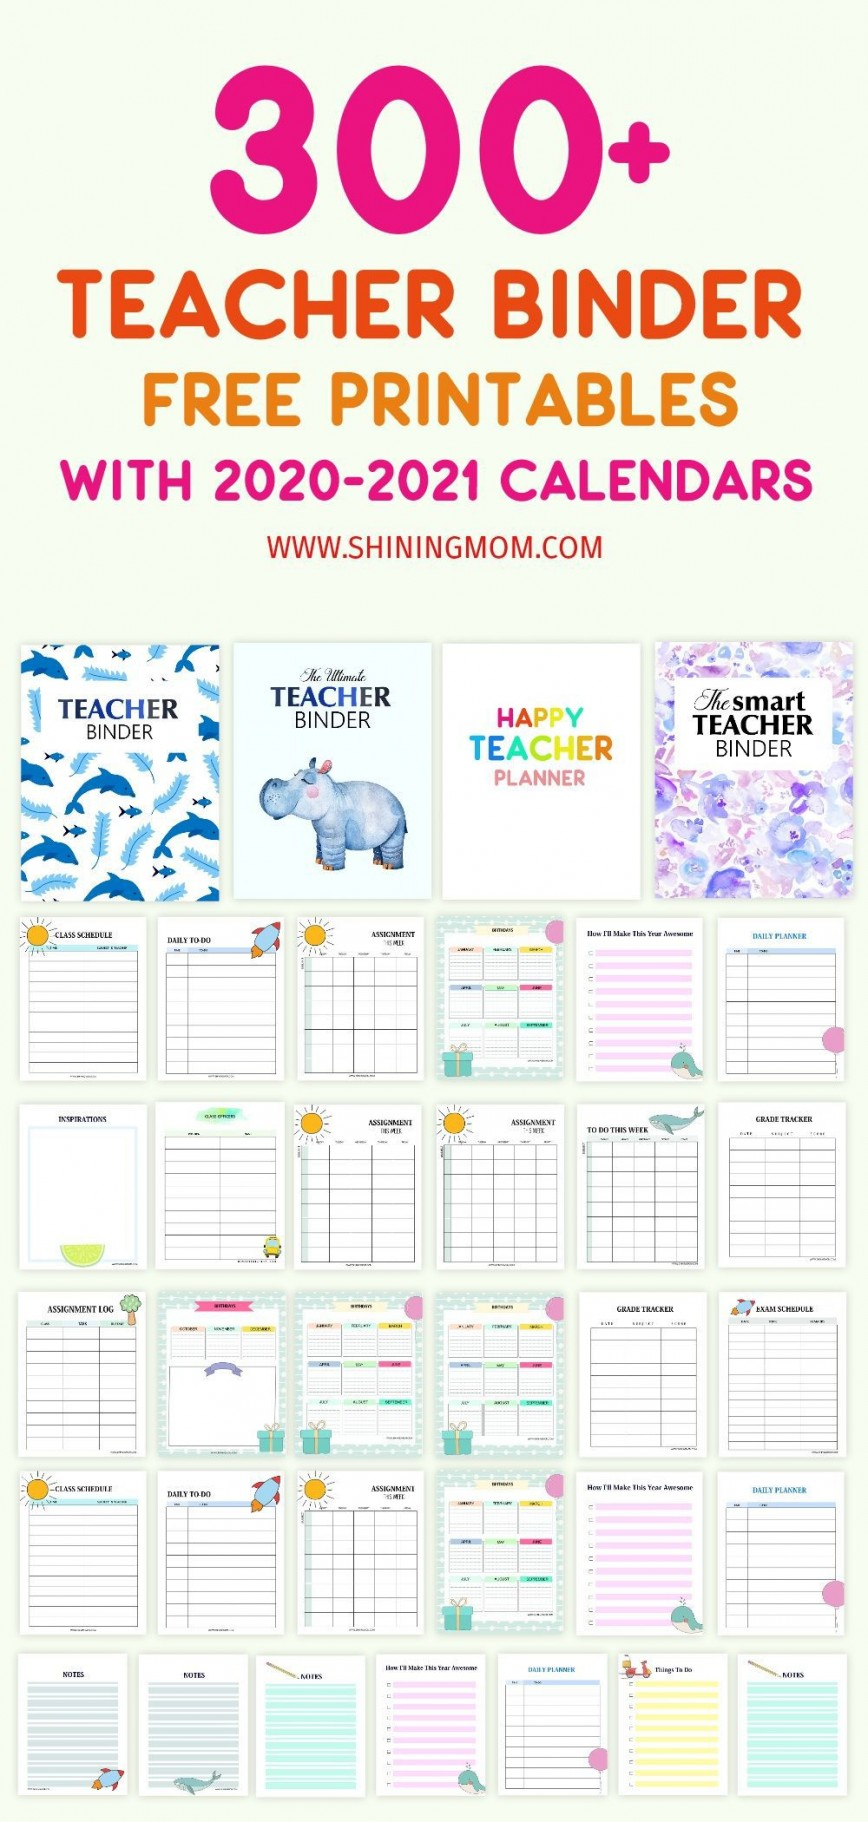 000 Sensational Free Printable Teacher Binder Template High Def 868